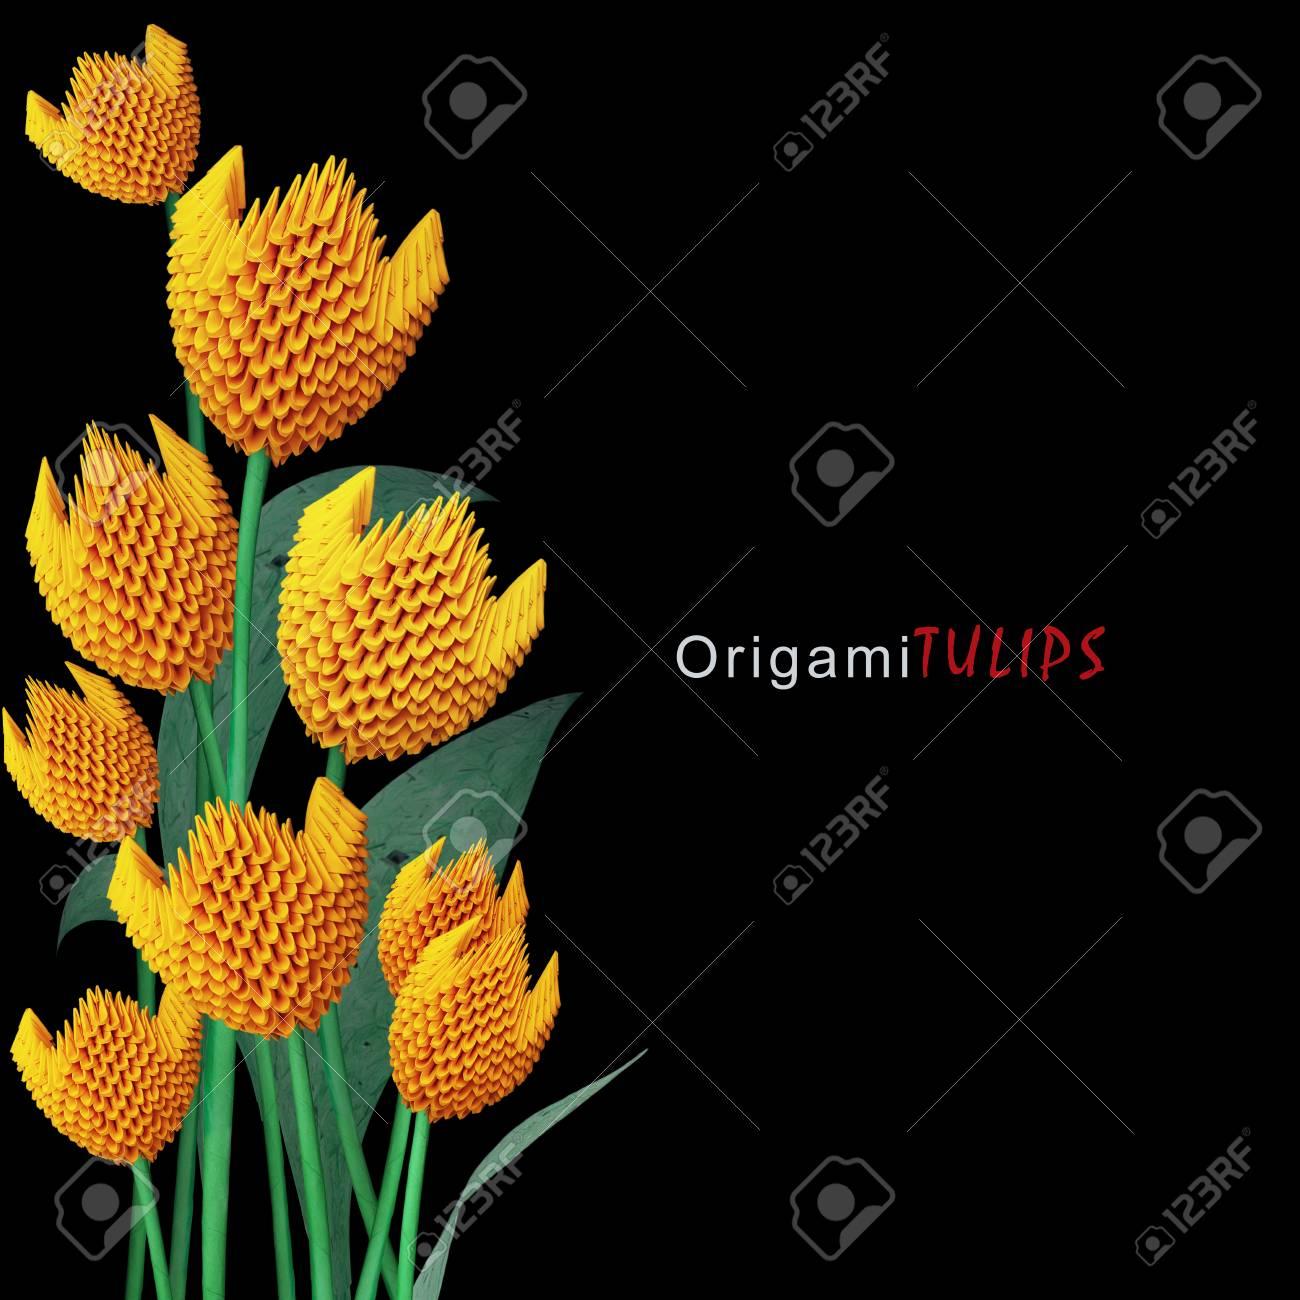 Origami 3d yellowr paper decoration tulip flowers bouquet on stock origami 3d yellowr paper decoration tulip flowers bouquet on a black background stock photo 54173579 mightylinksfo